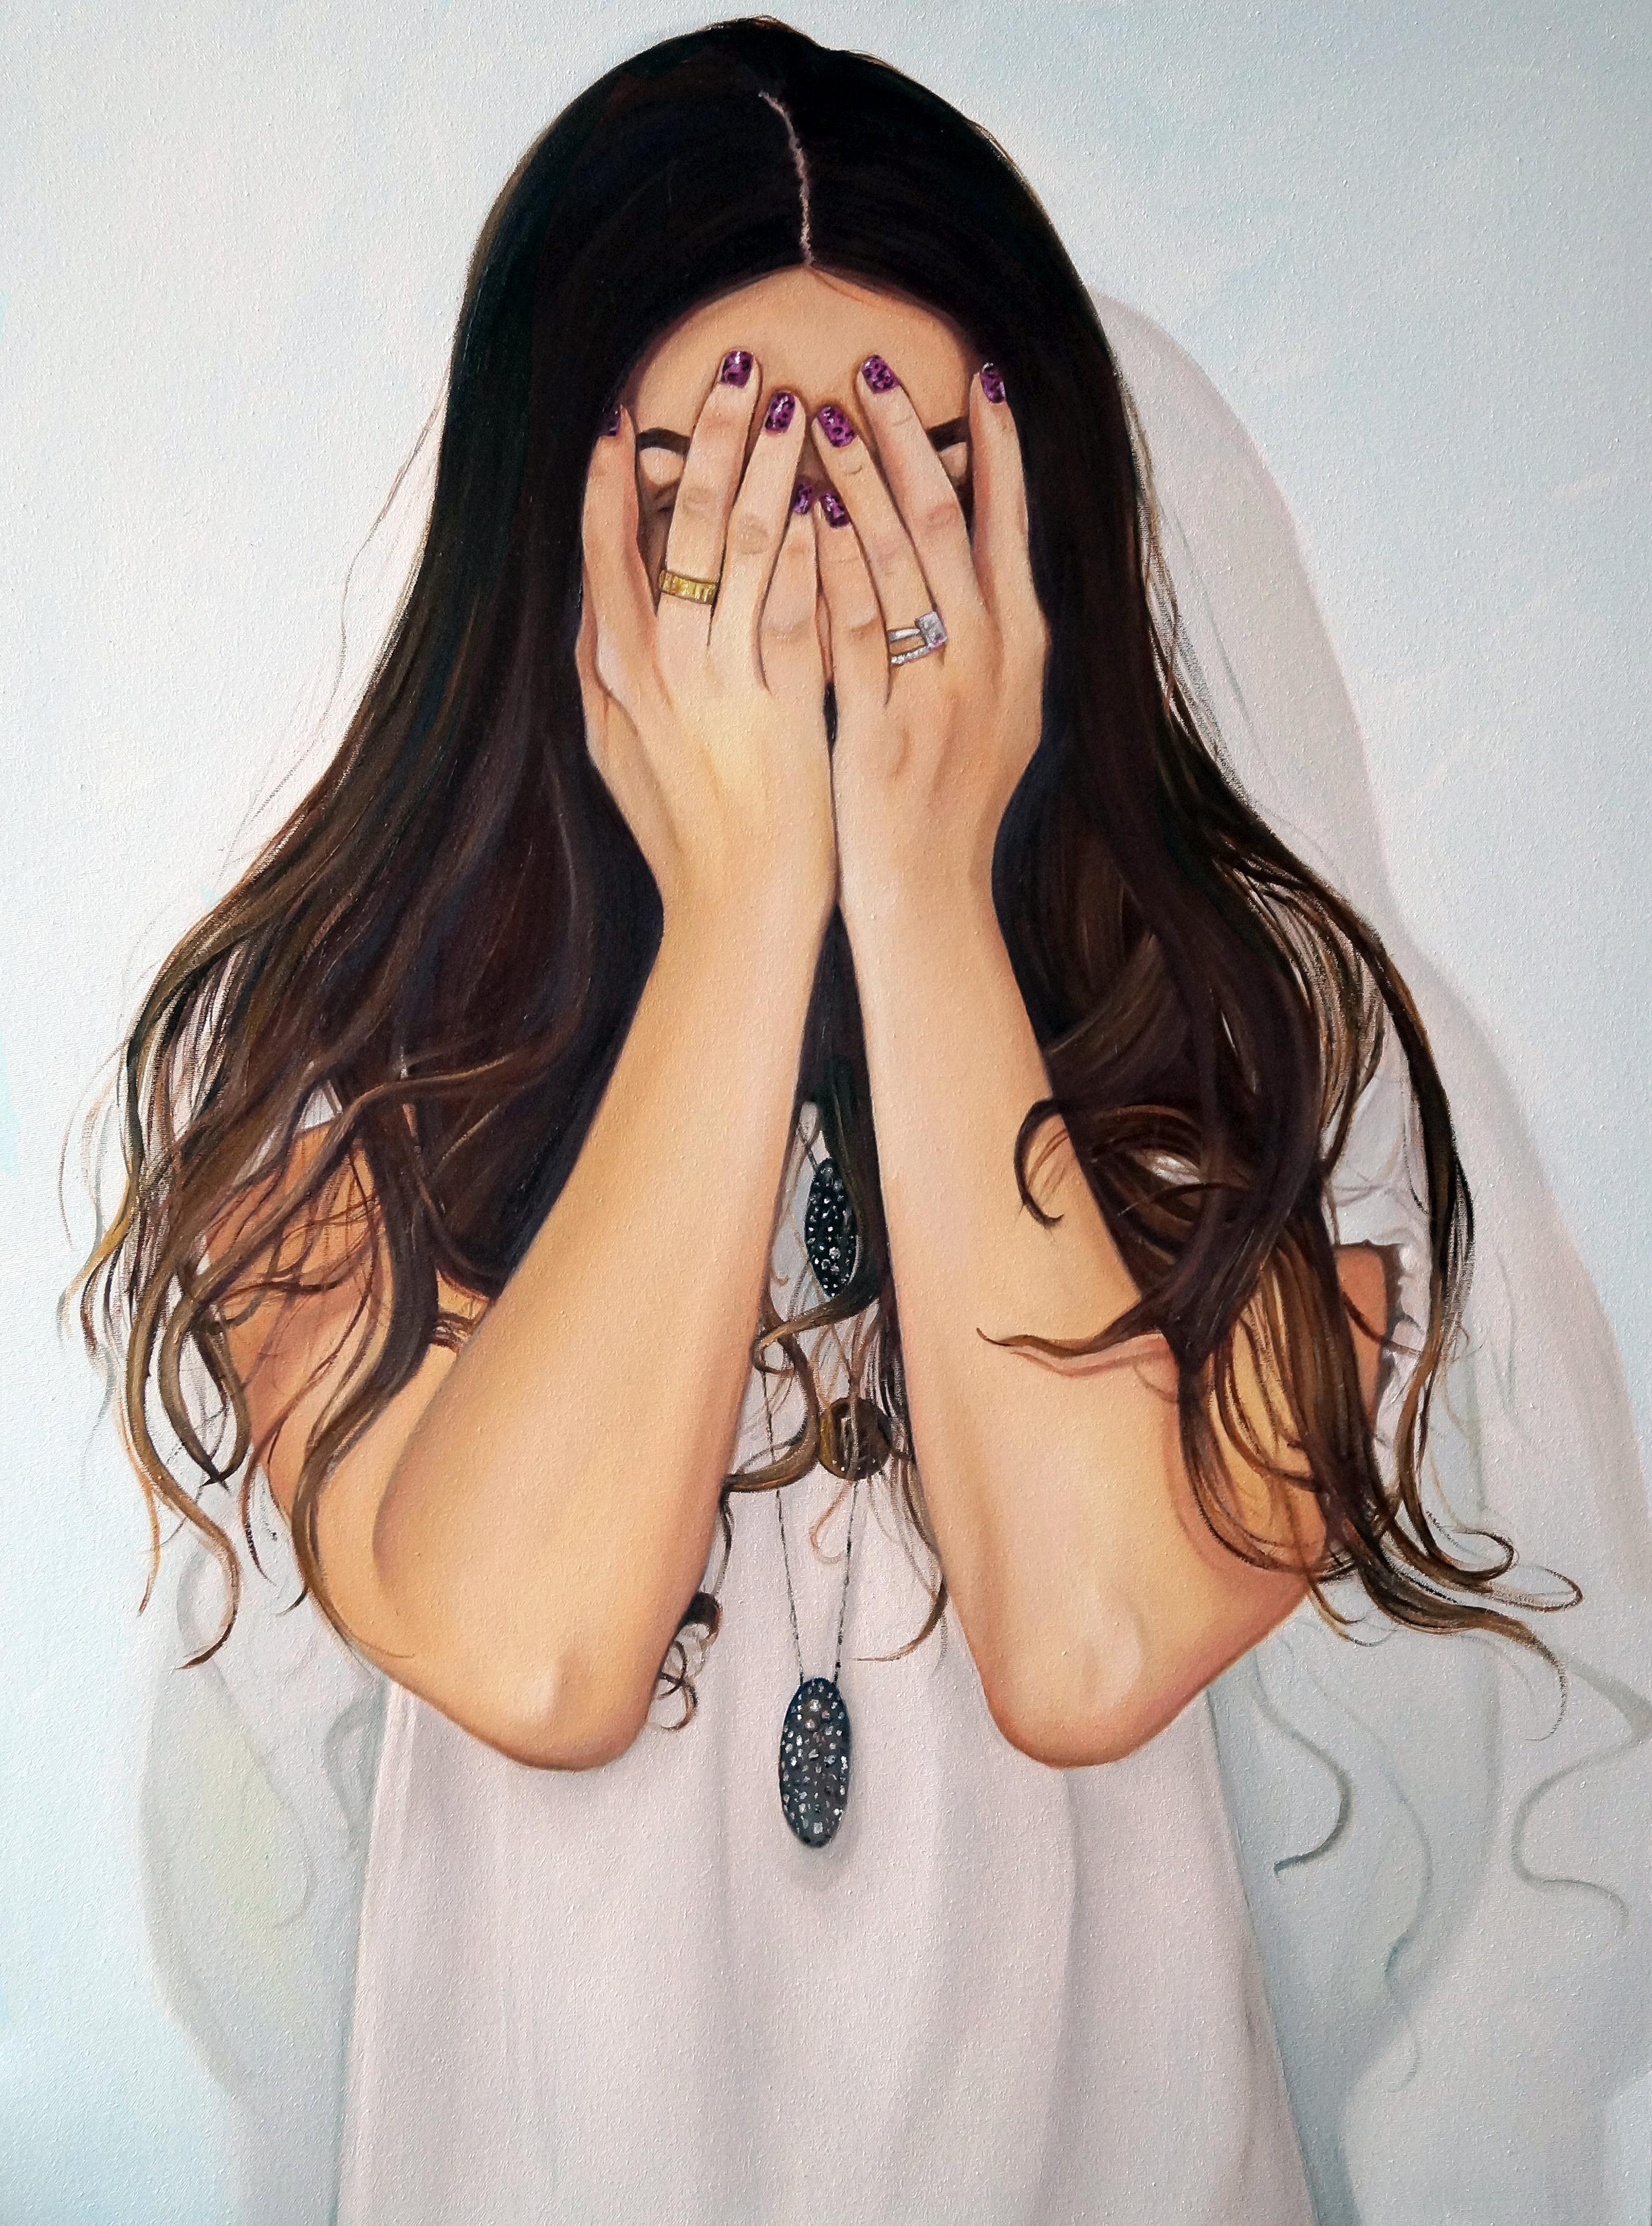 2013-aliza-stone-howard-self-portrait-30x40.jpg